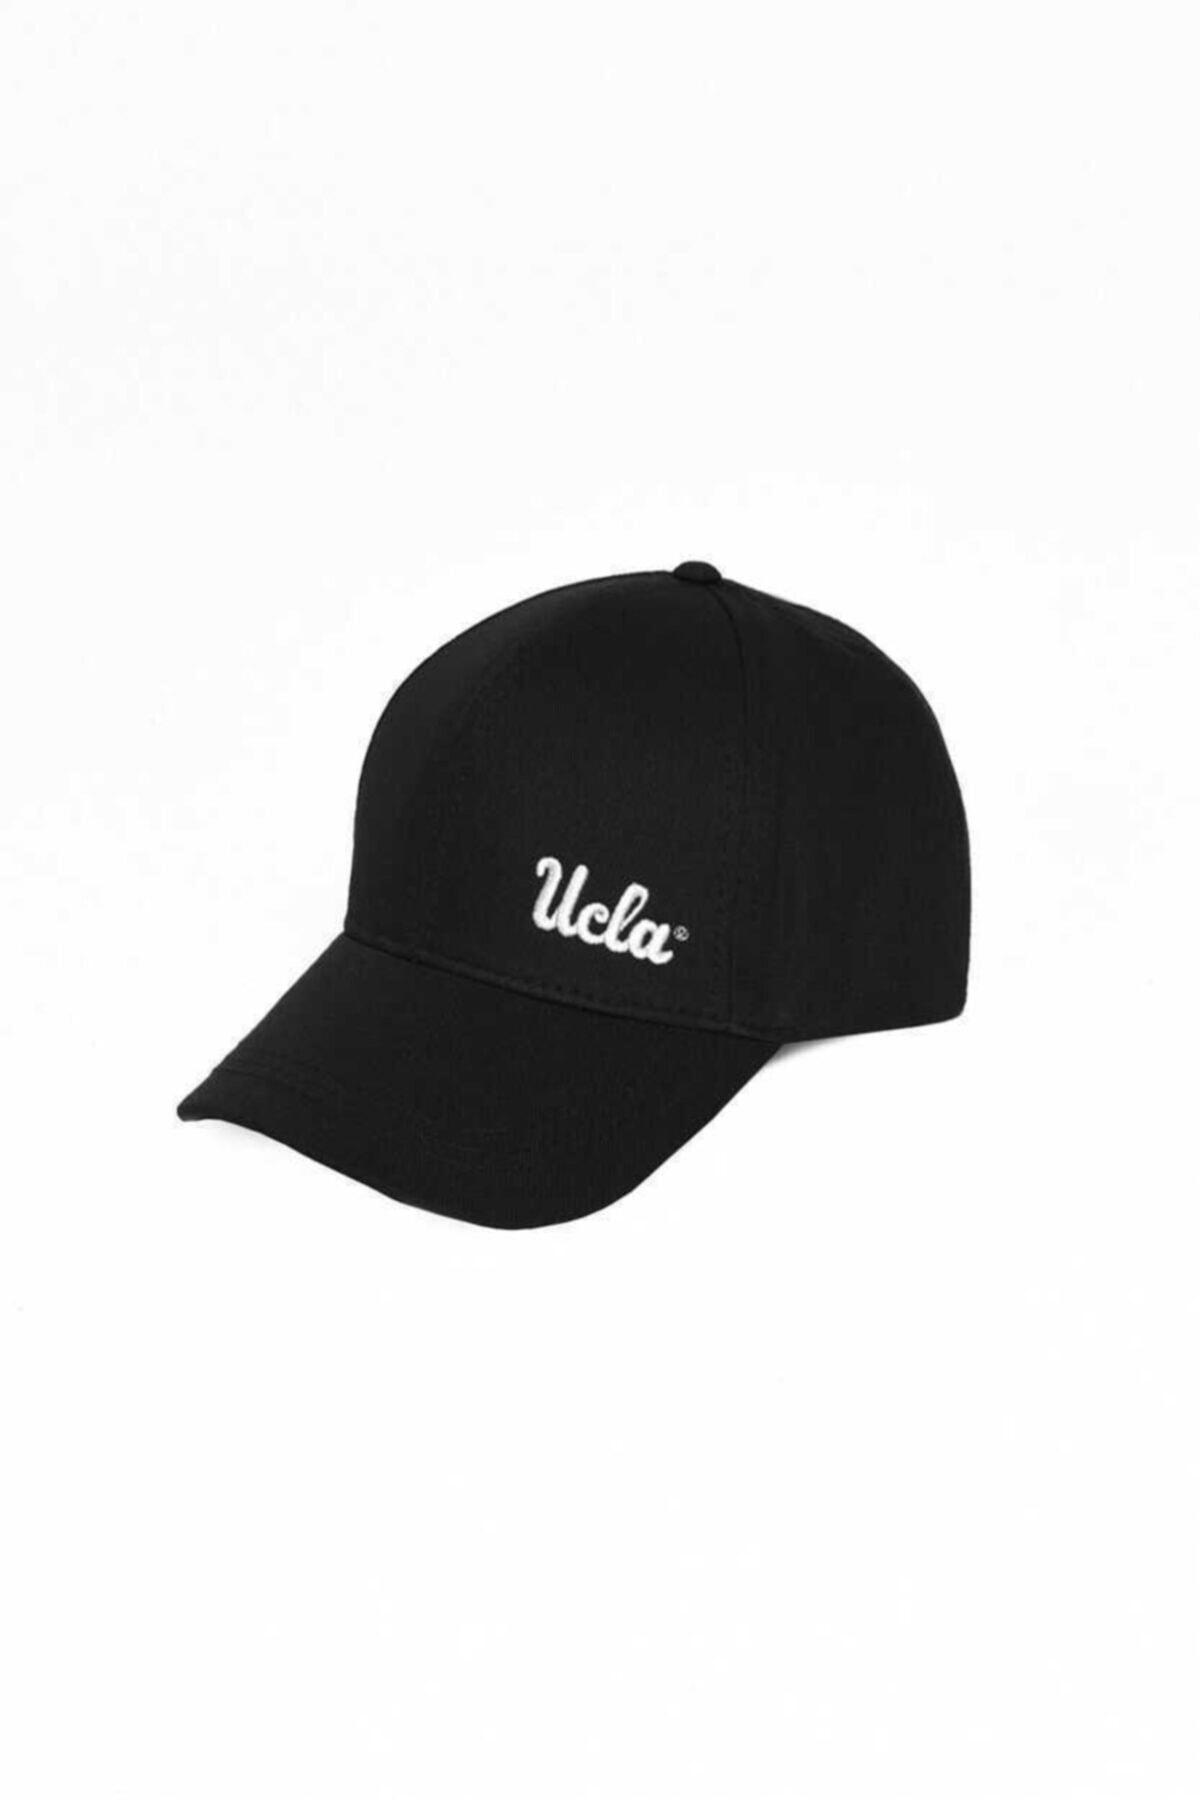 Jenner Siyah Baseball Cap Nakışlı Şapka